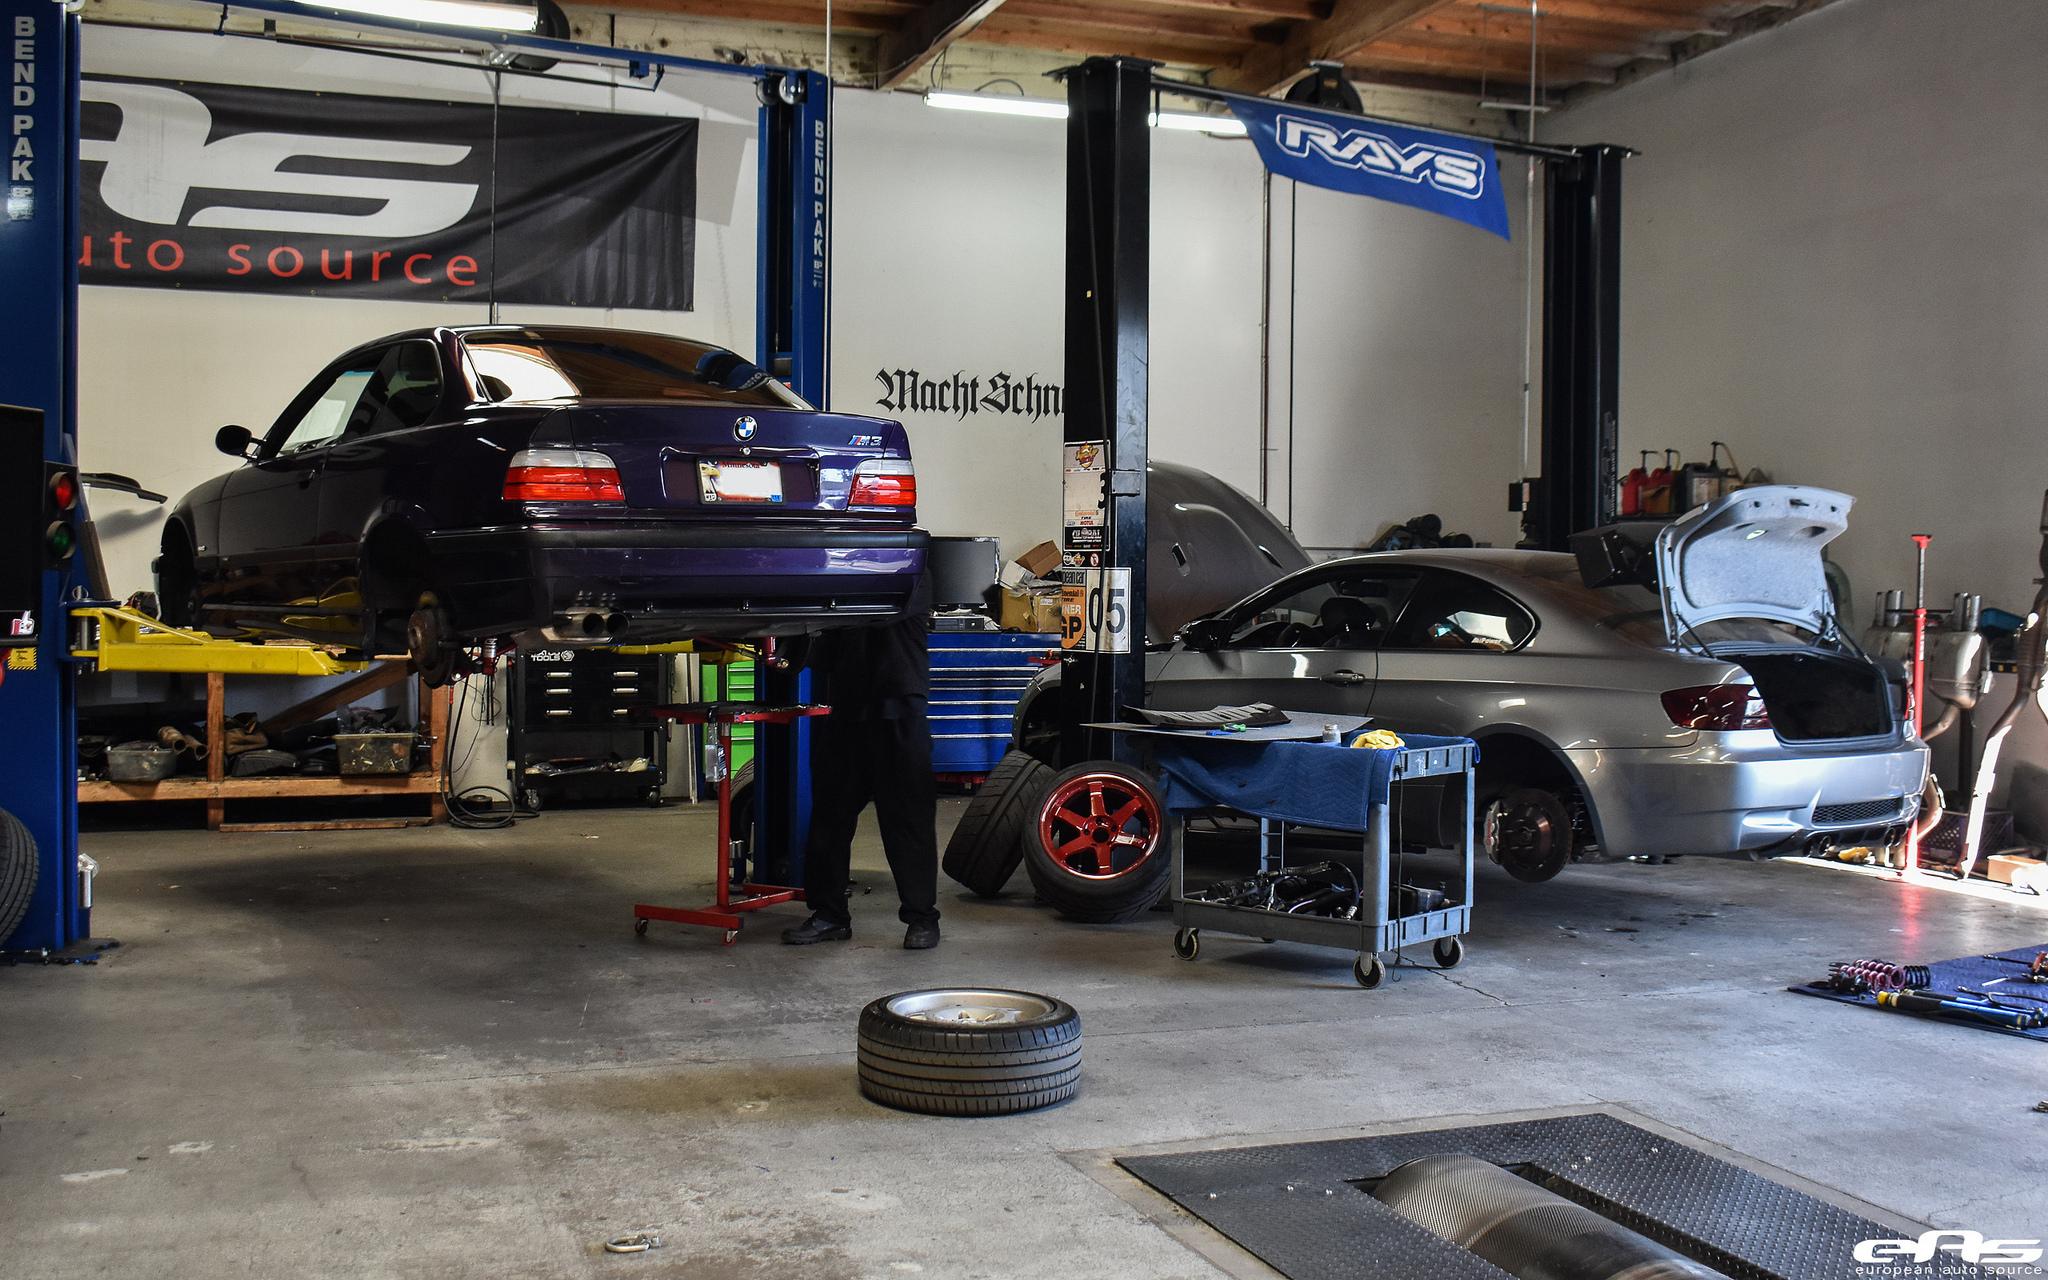 Techno Violet Metallic BMW E36 M3 Build By European Auto Source Image 1